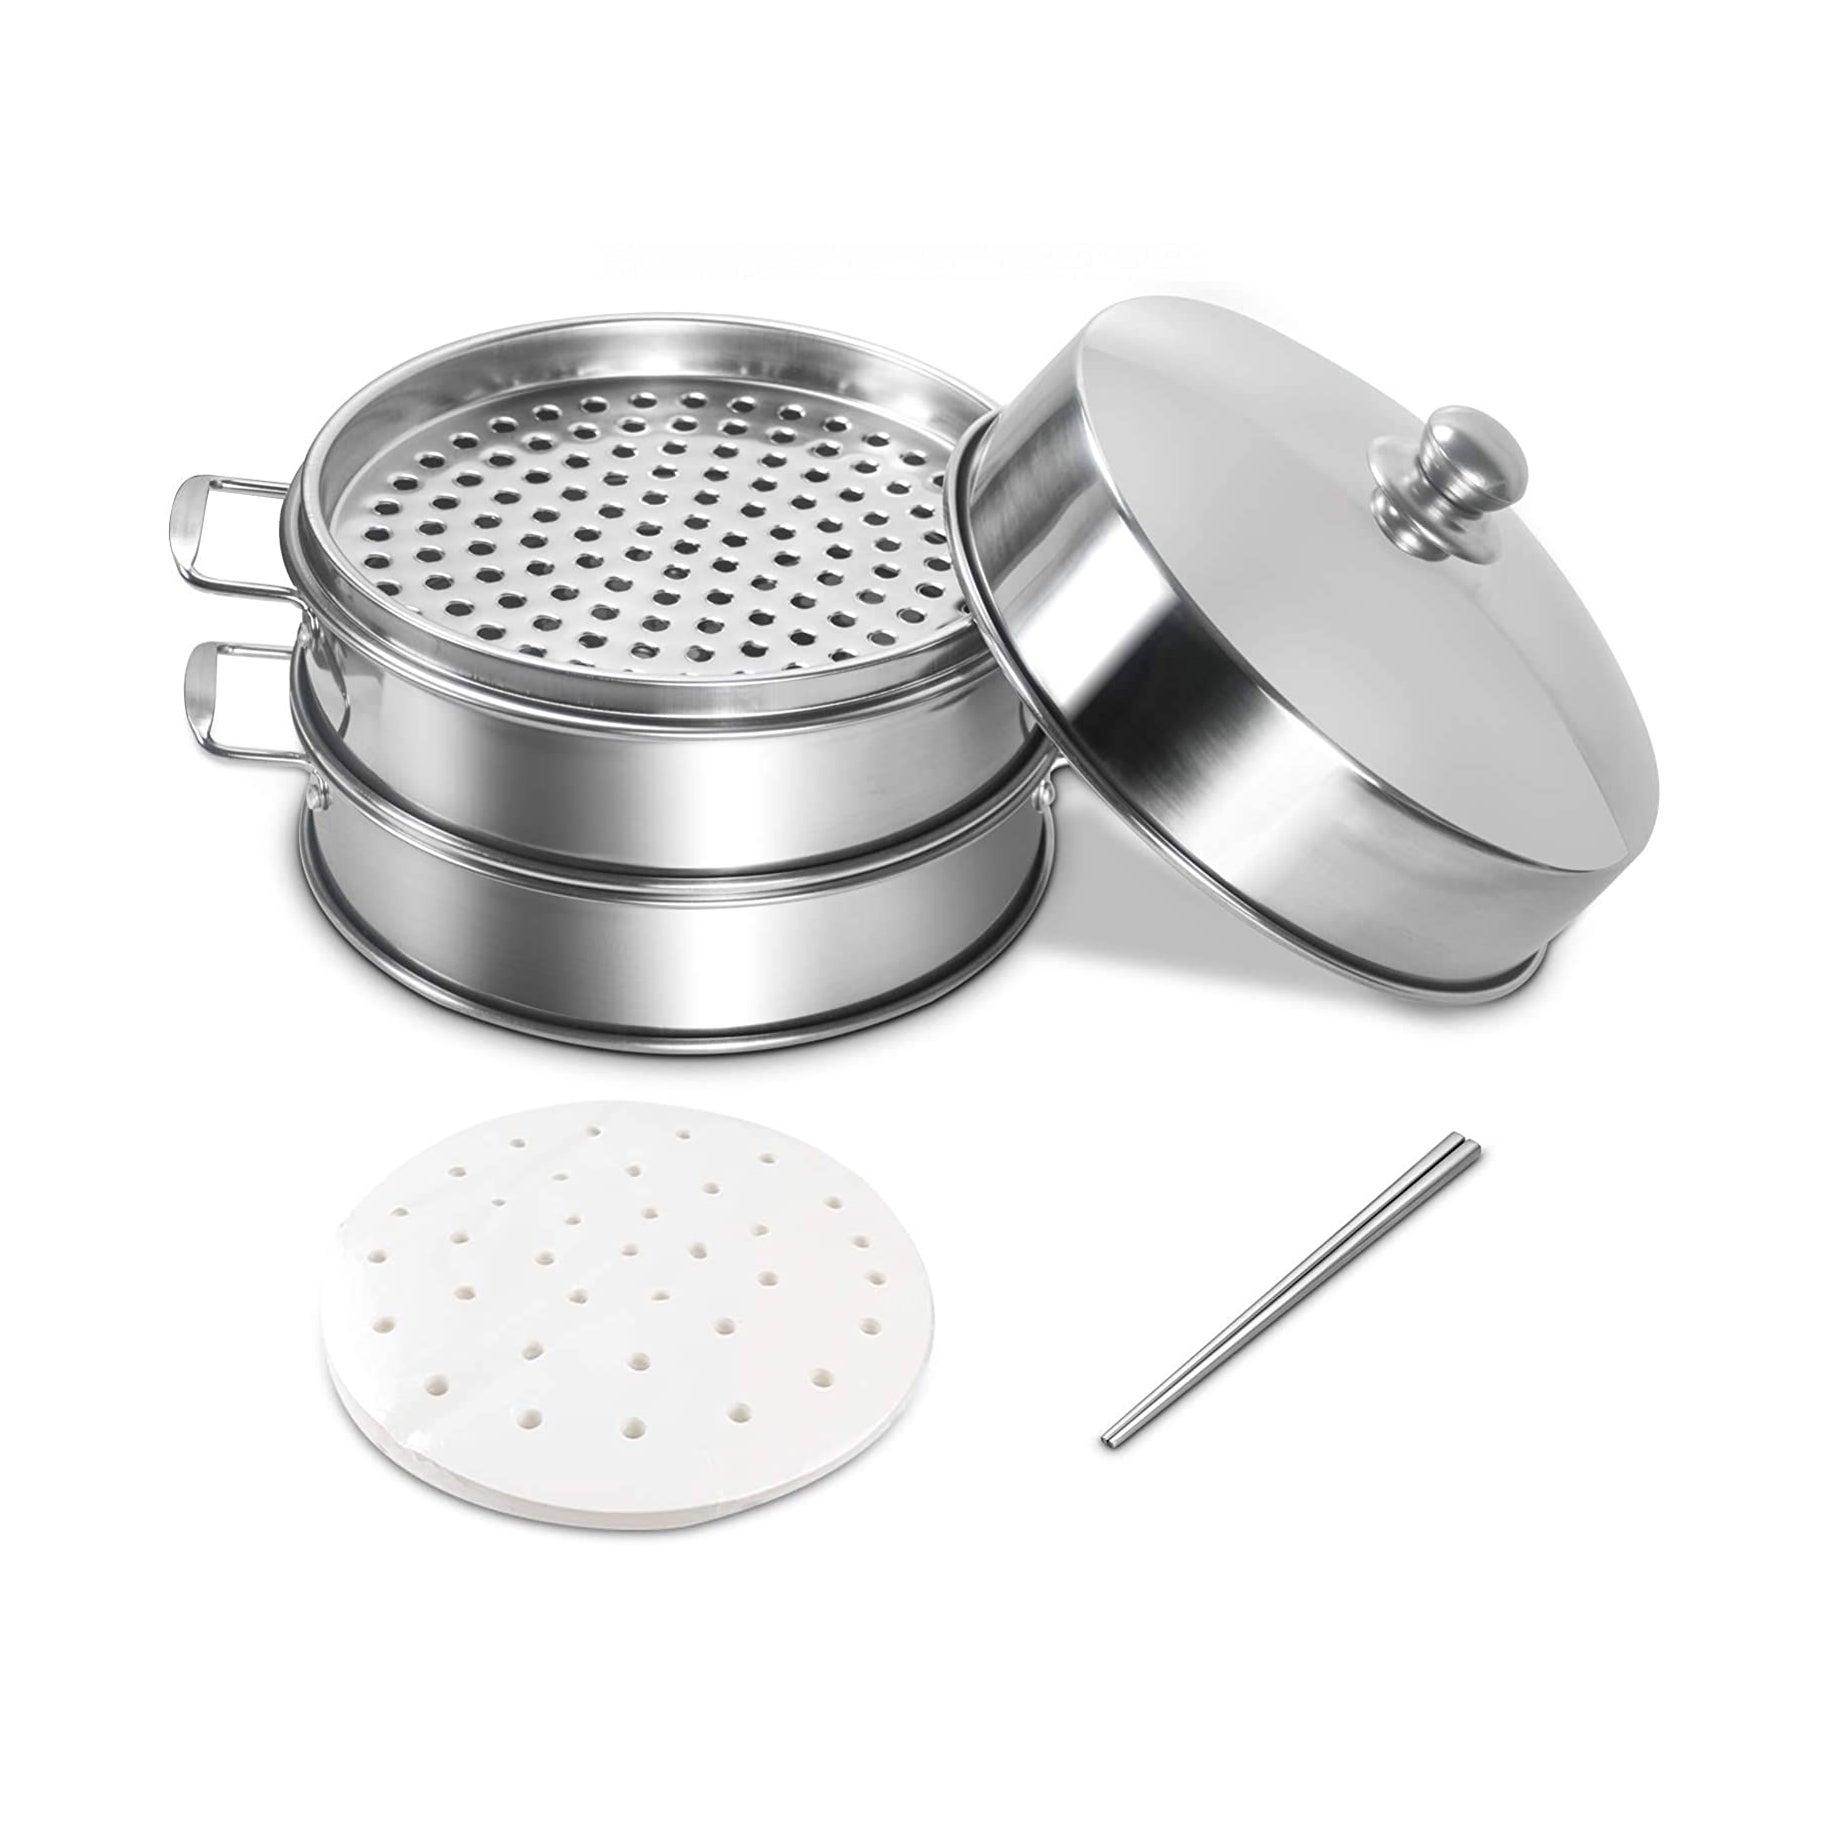 The Best Food Steamers Option: Anlisnut Stainless Steel Steamer